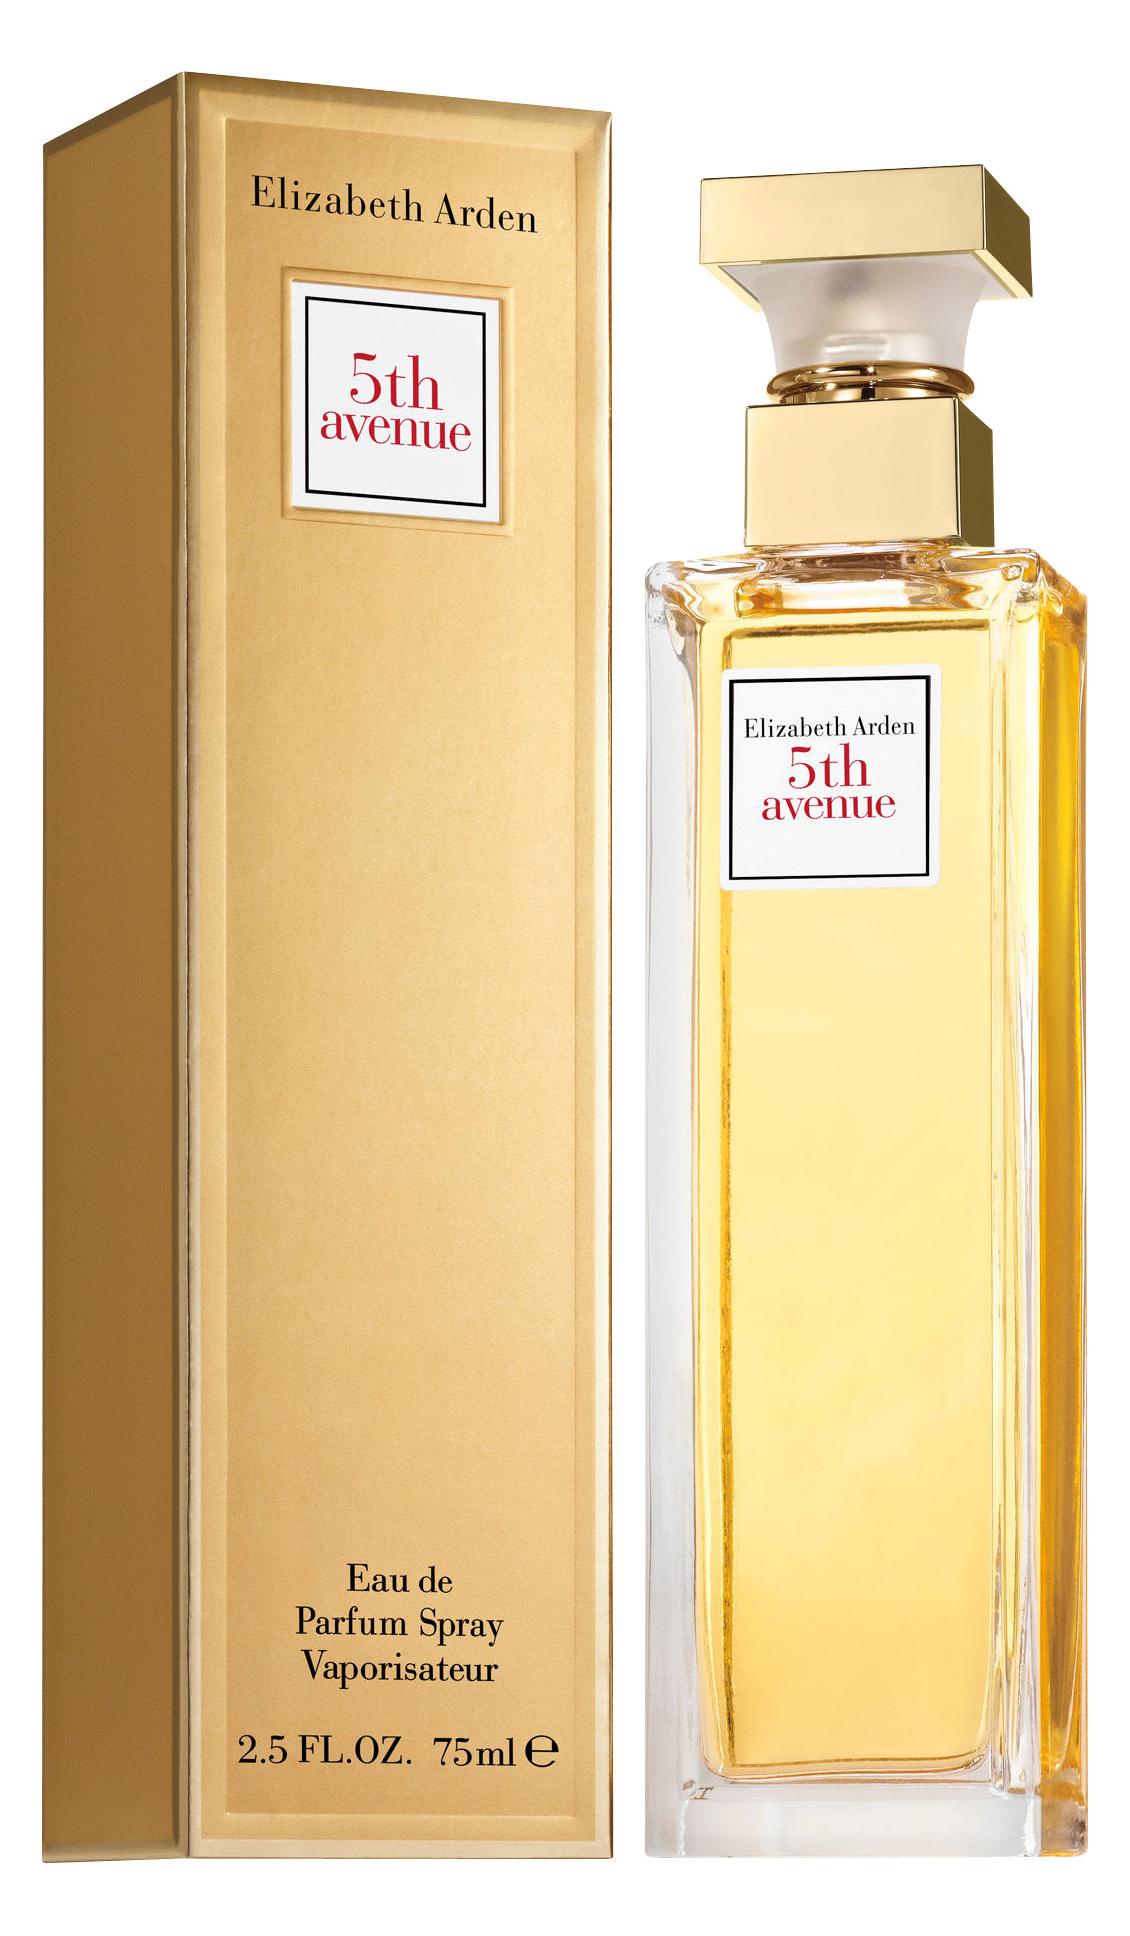 fifth avenue parfum